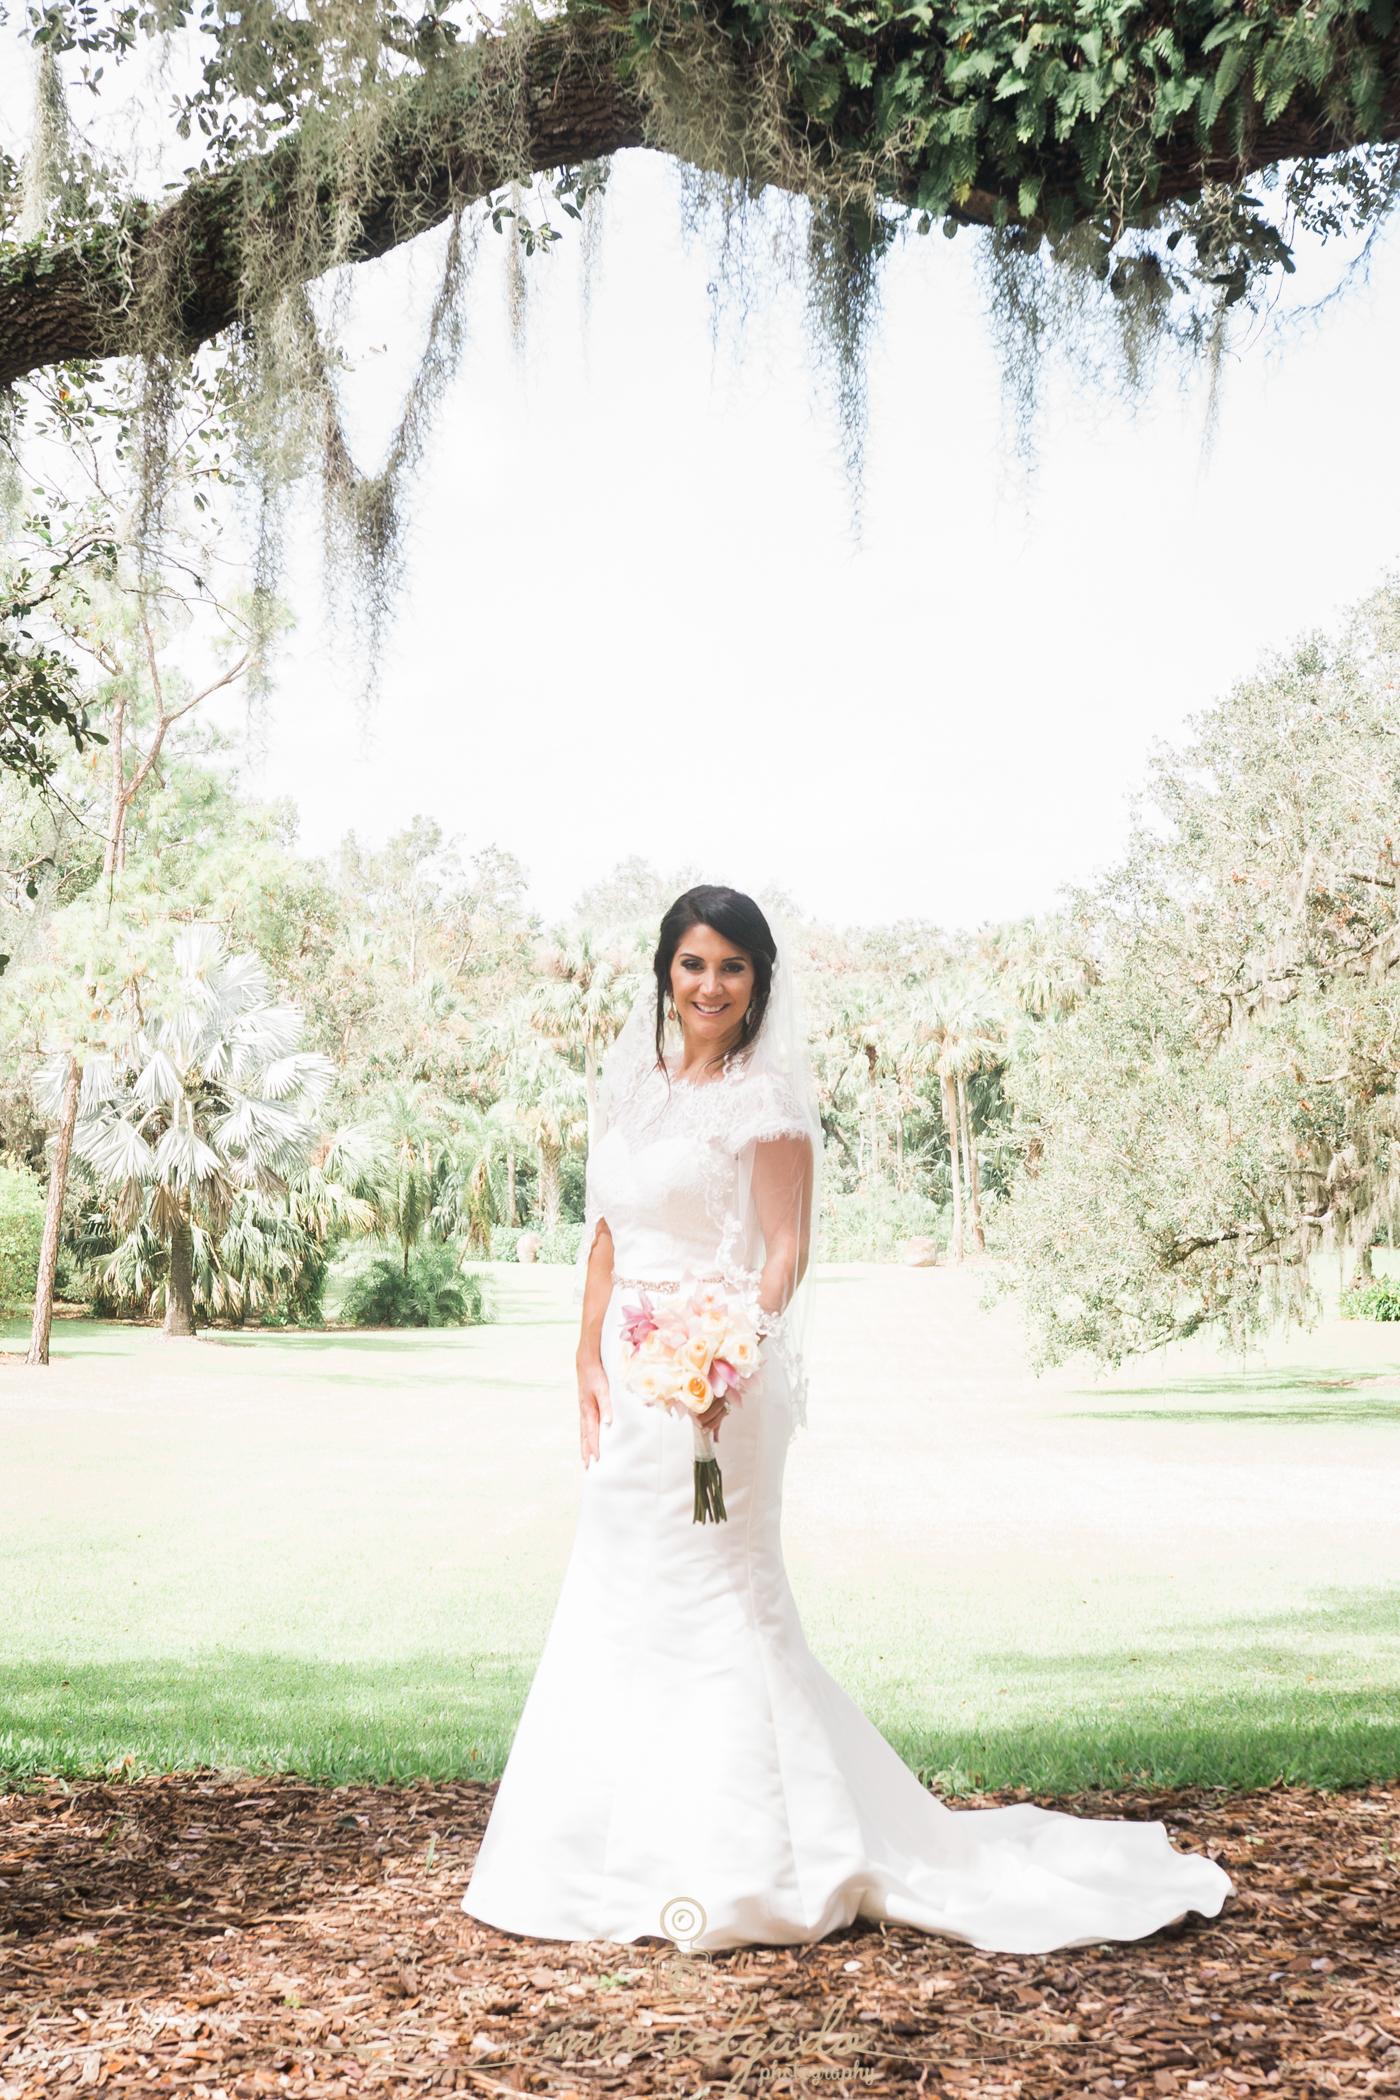 Bok-tower-gardens-wedding-photo, bride-photo, Tampa-wedding-photographer